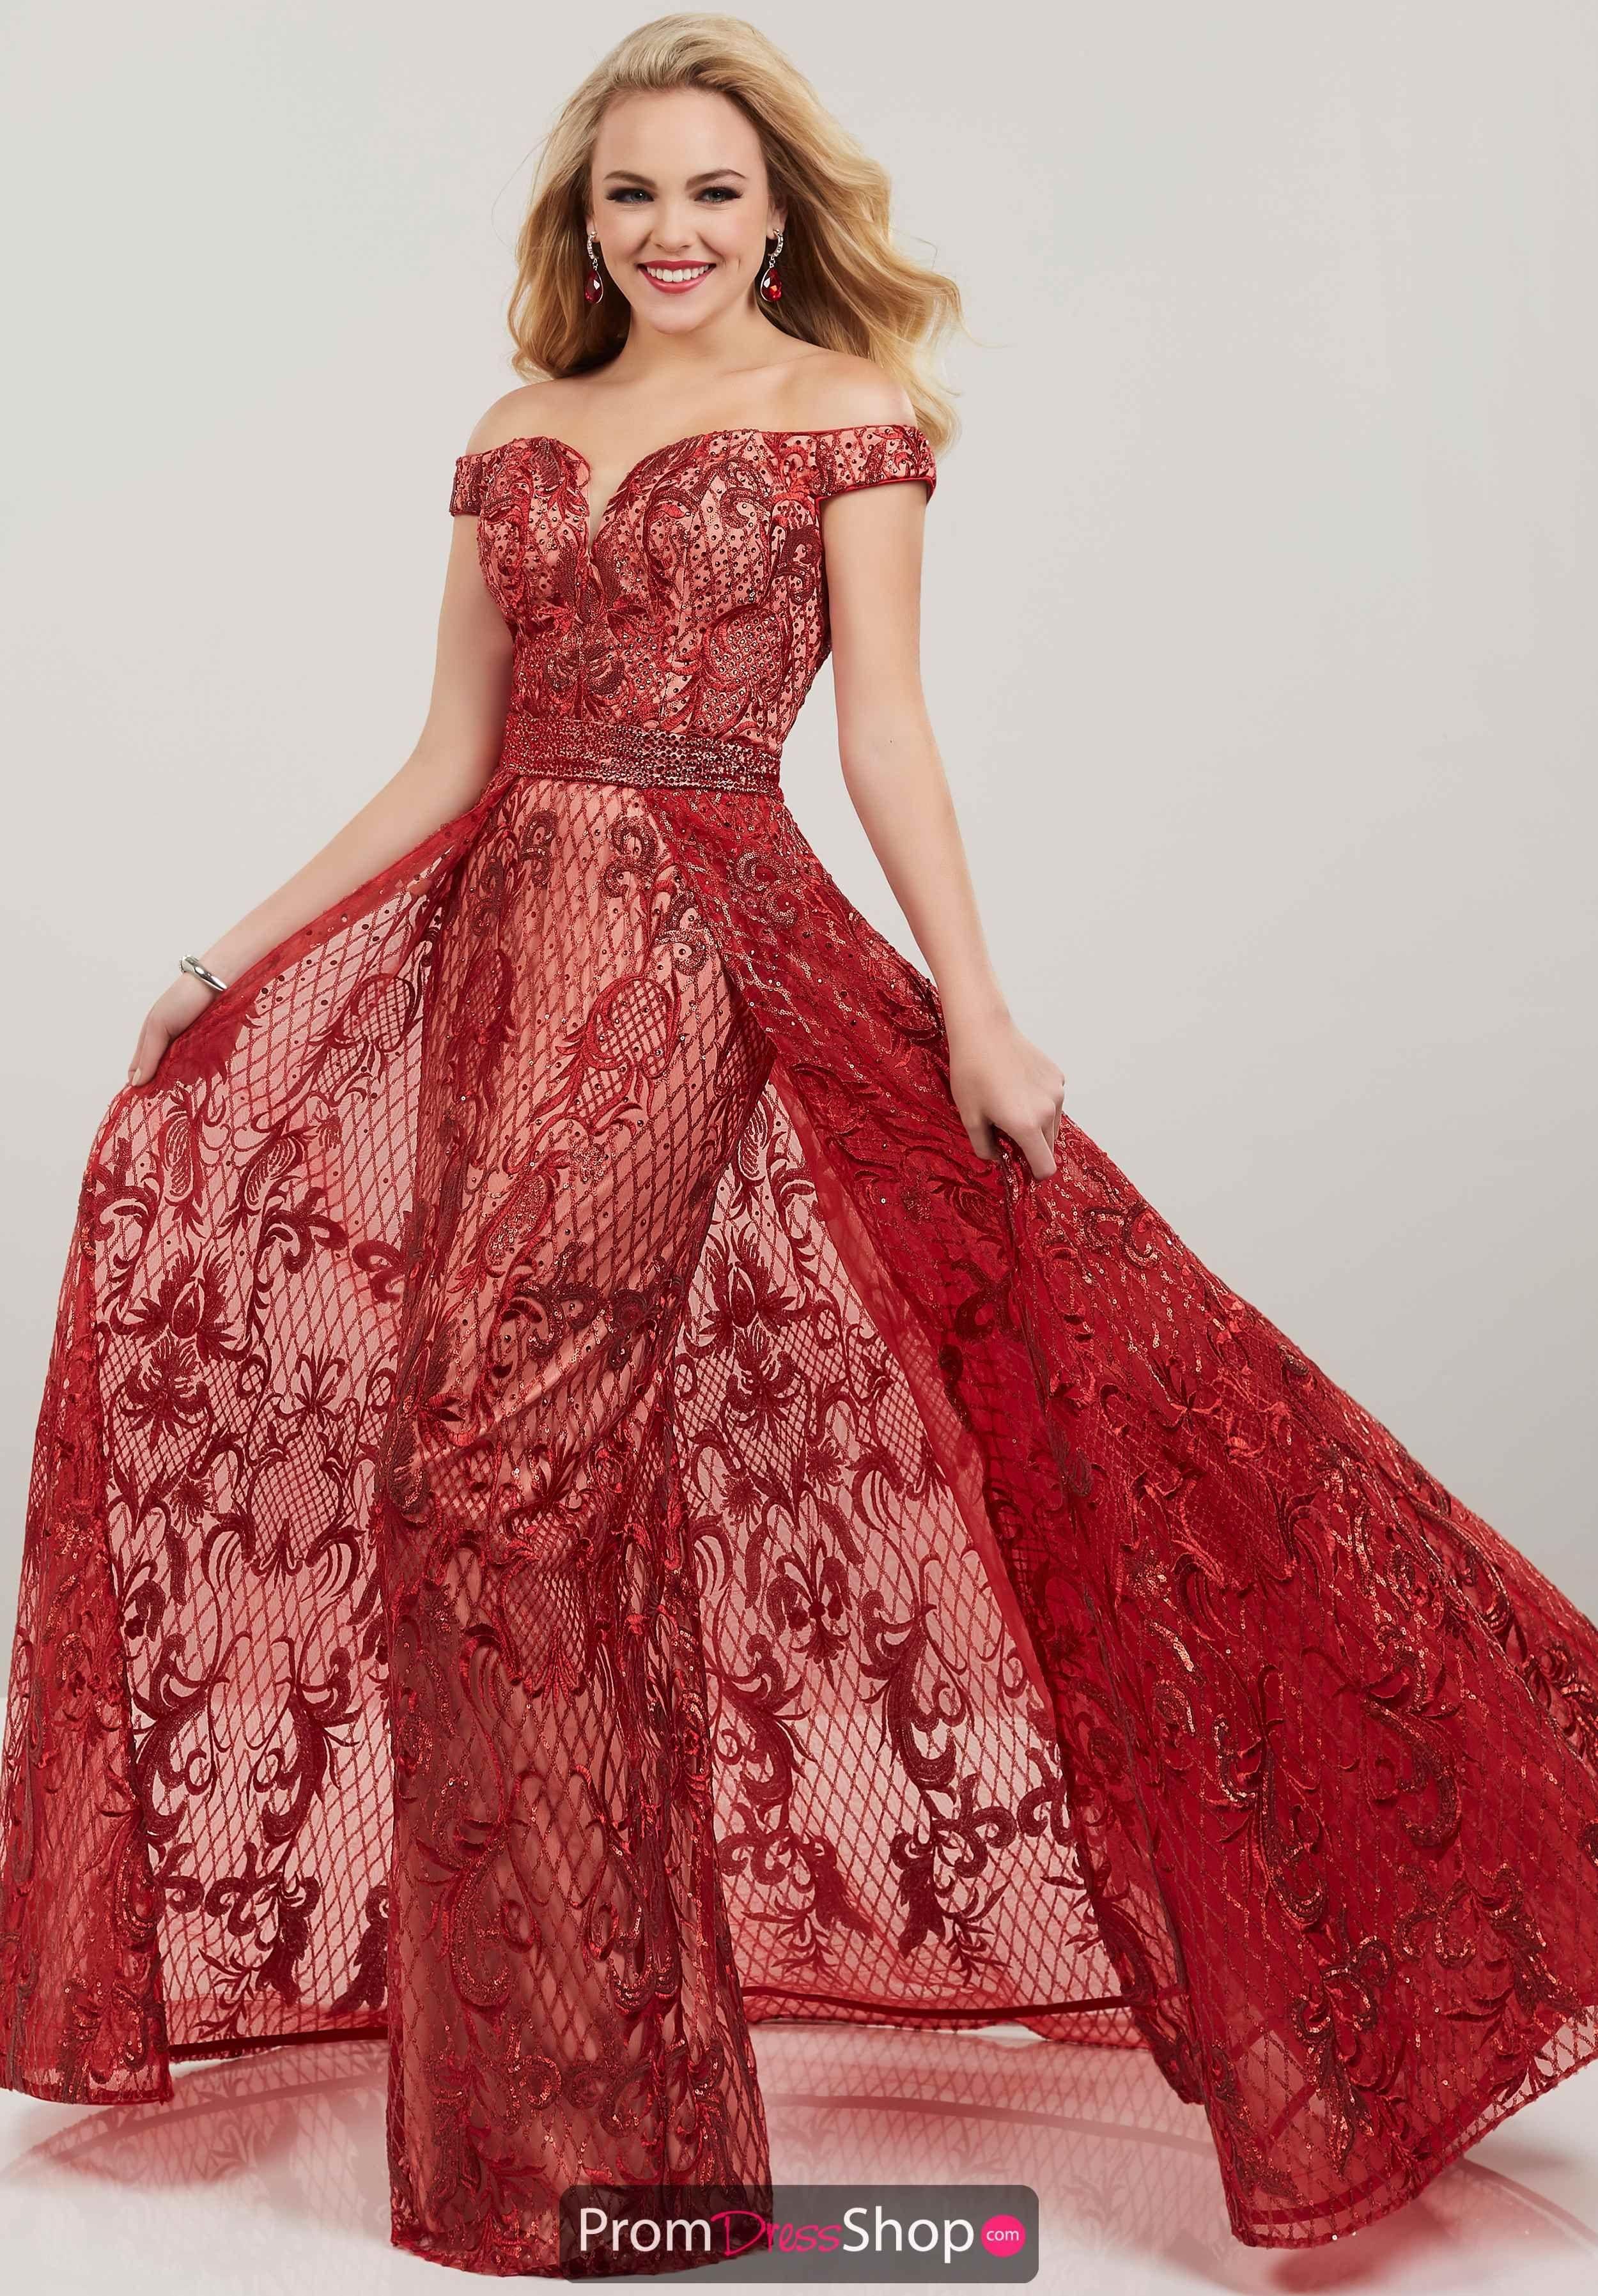 Panoply Prom Dresses Panoply Prom Dress Dresses Panoply Dresses [ 3593 x 2500 Pixel ]